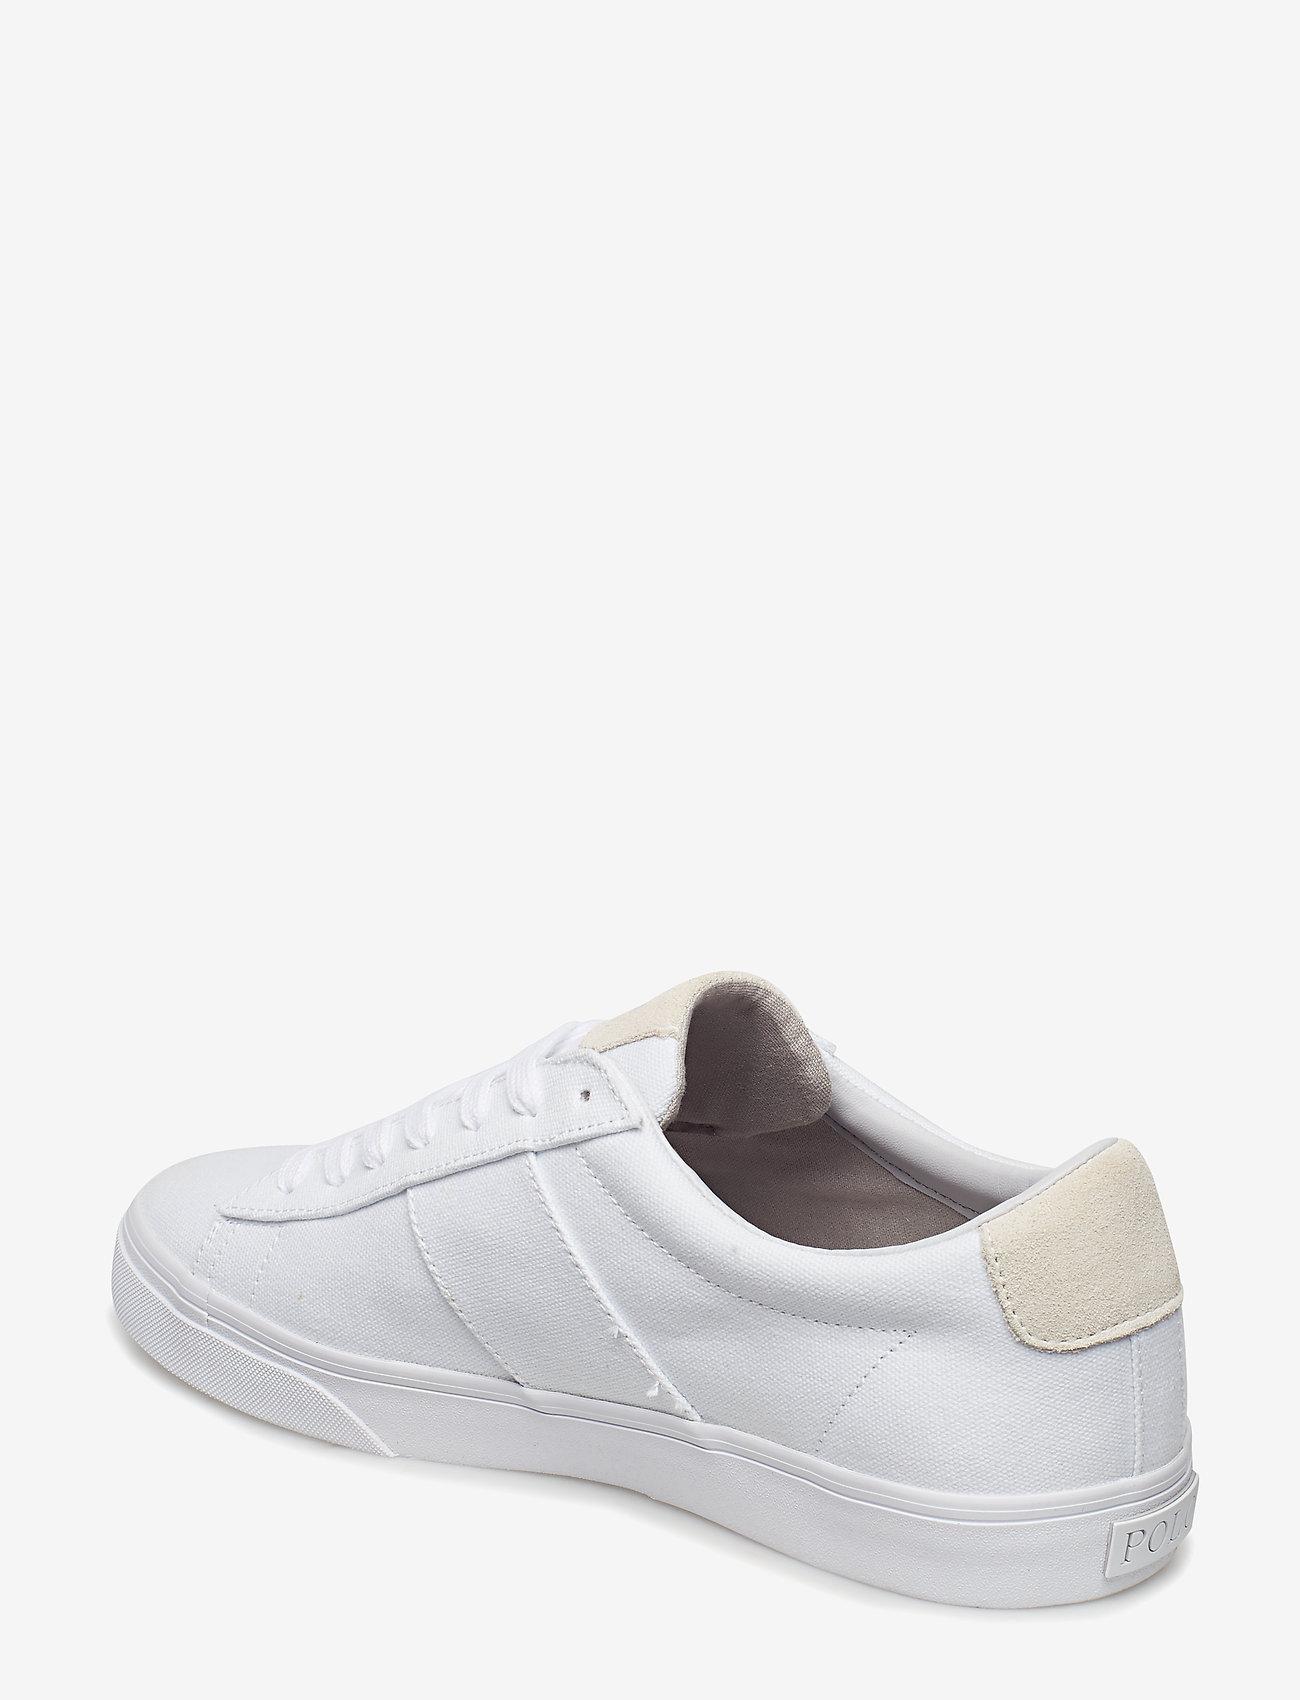 Polo Ralph Lauren Sayer Canvas Sneaker - Sneakers WHITE - Schuhe Billige